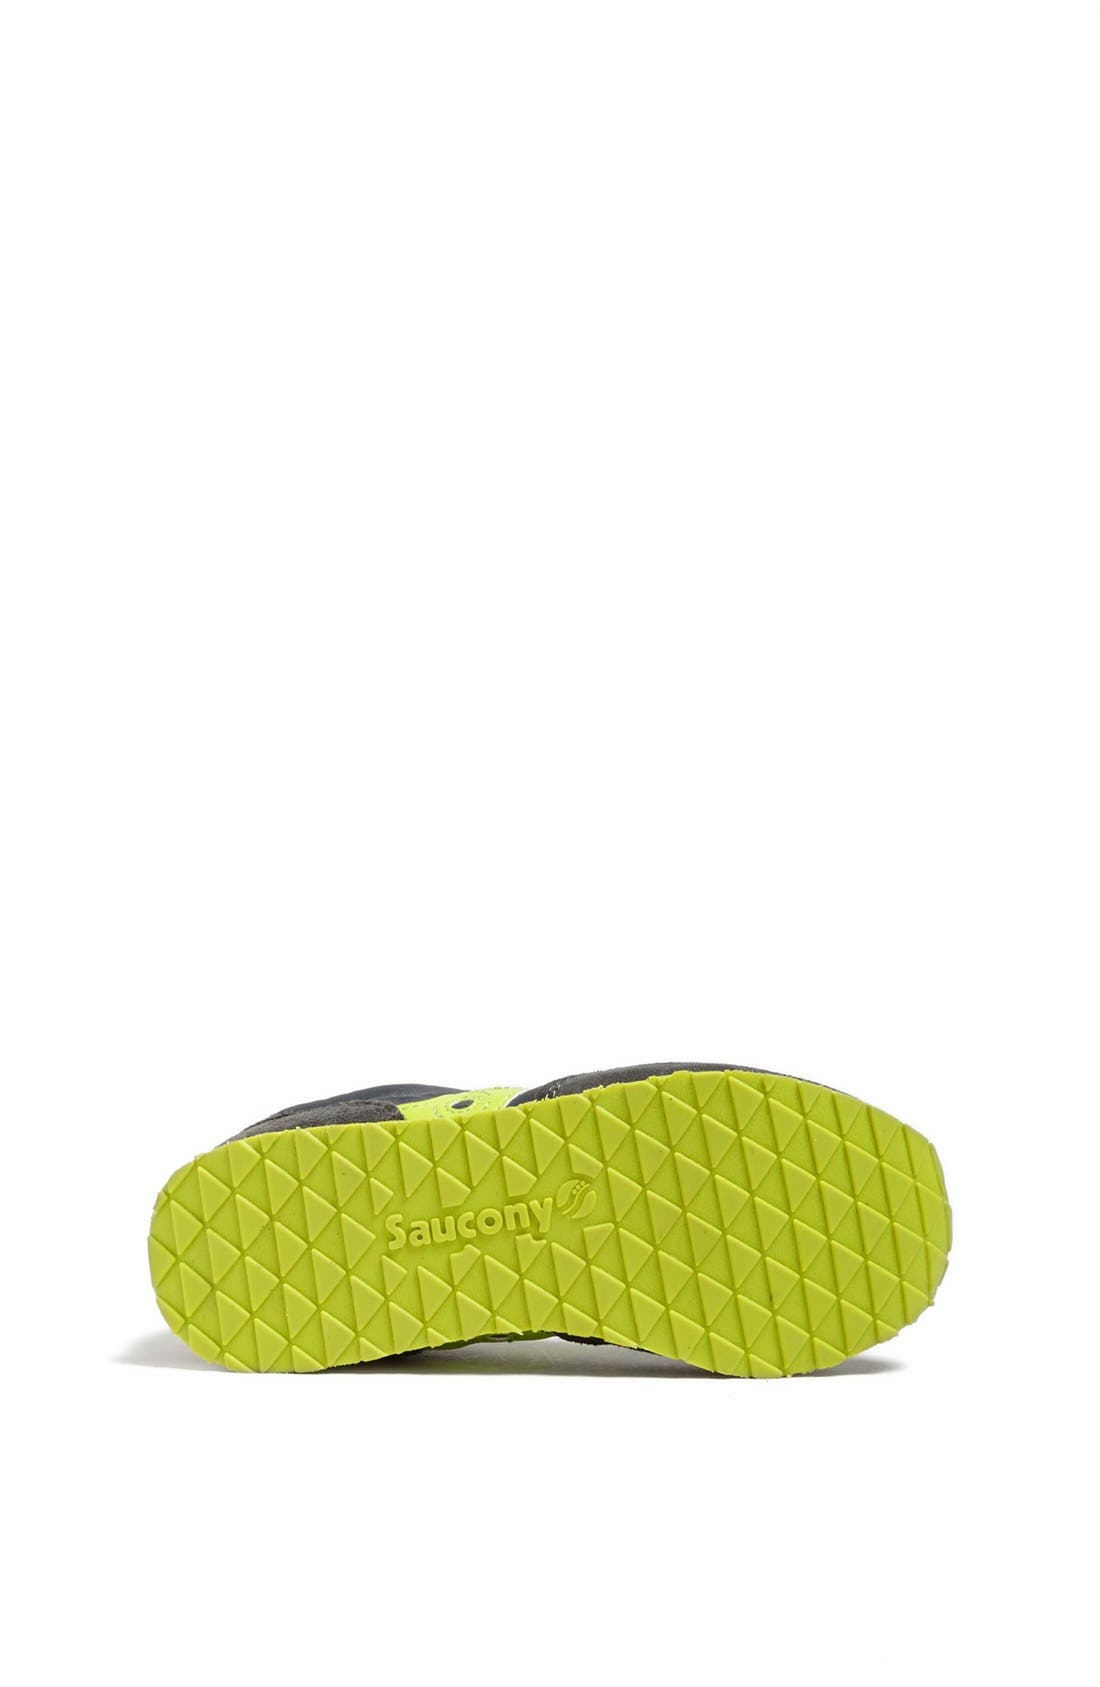 Alternate Image 4  - Saucony 'Jazz - LowPro' Sneaker (Toddler & Little Kid)